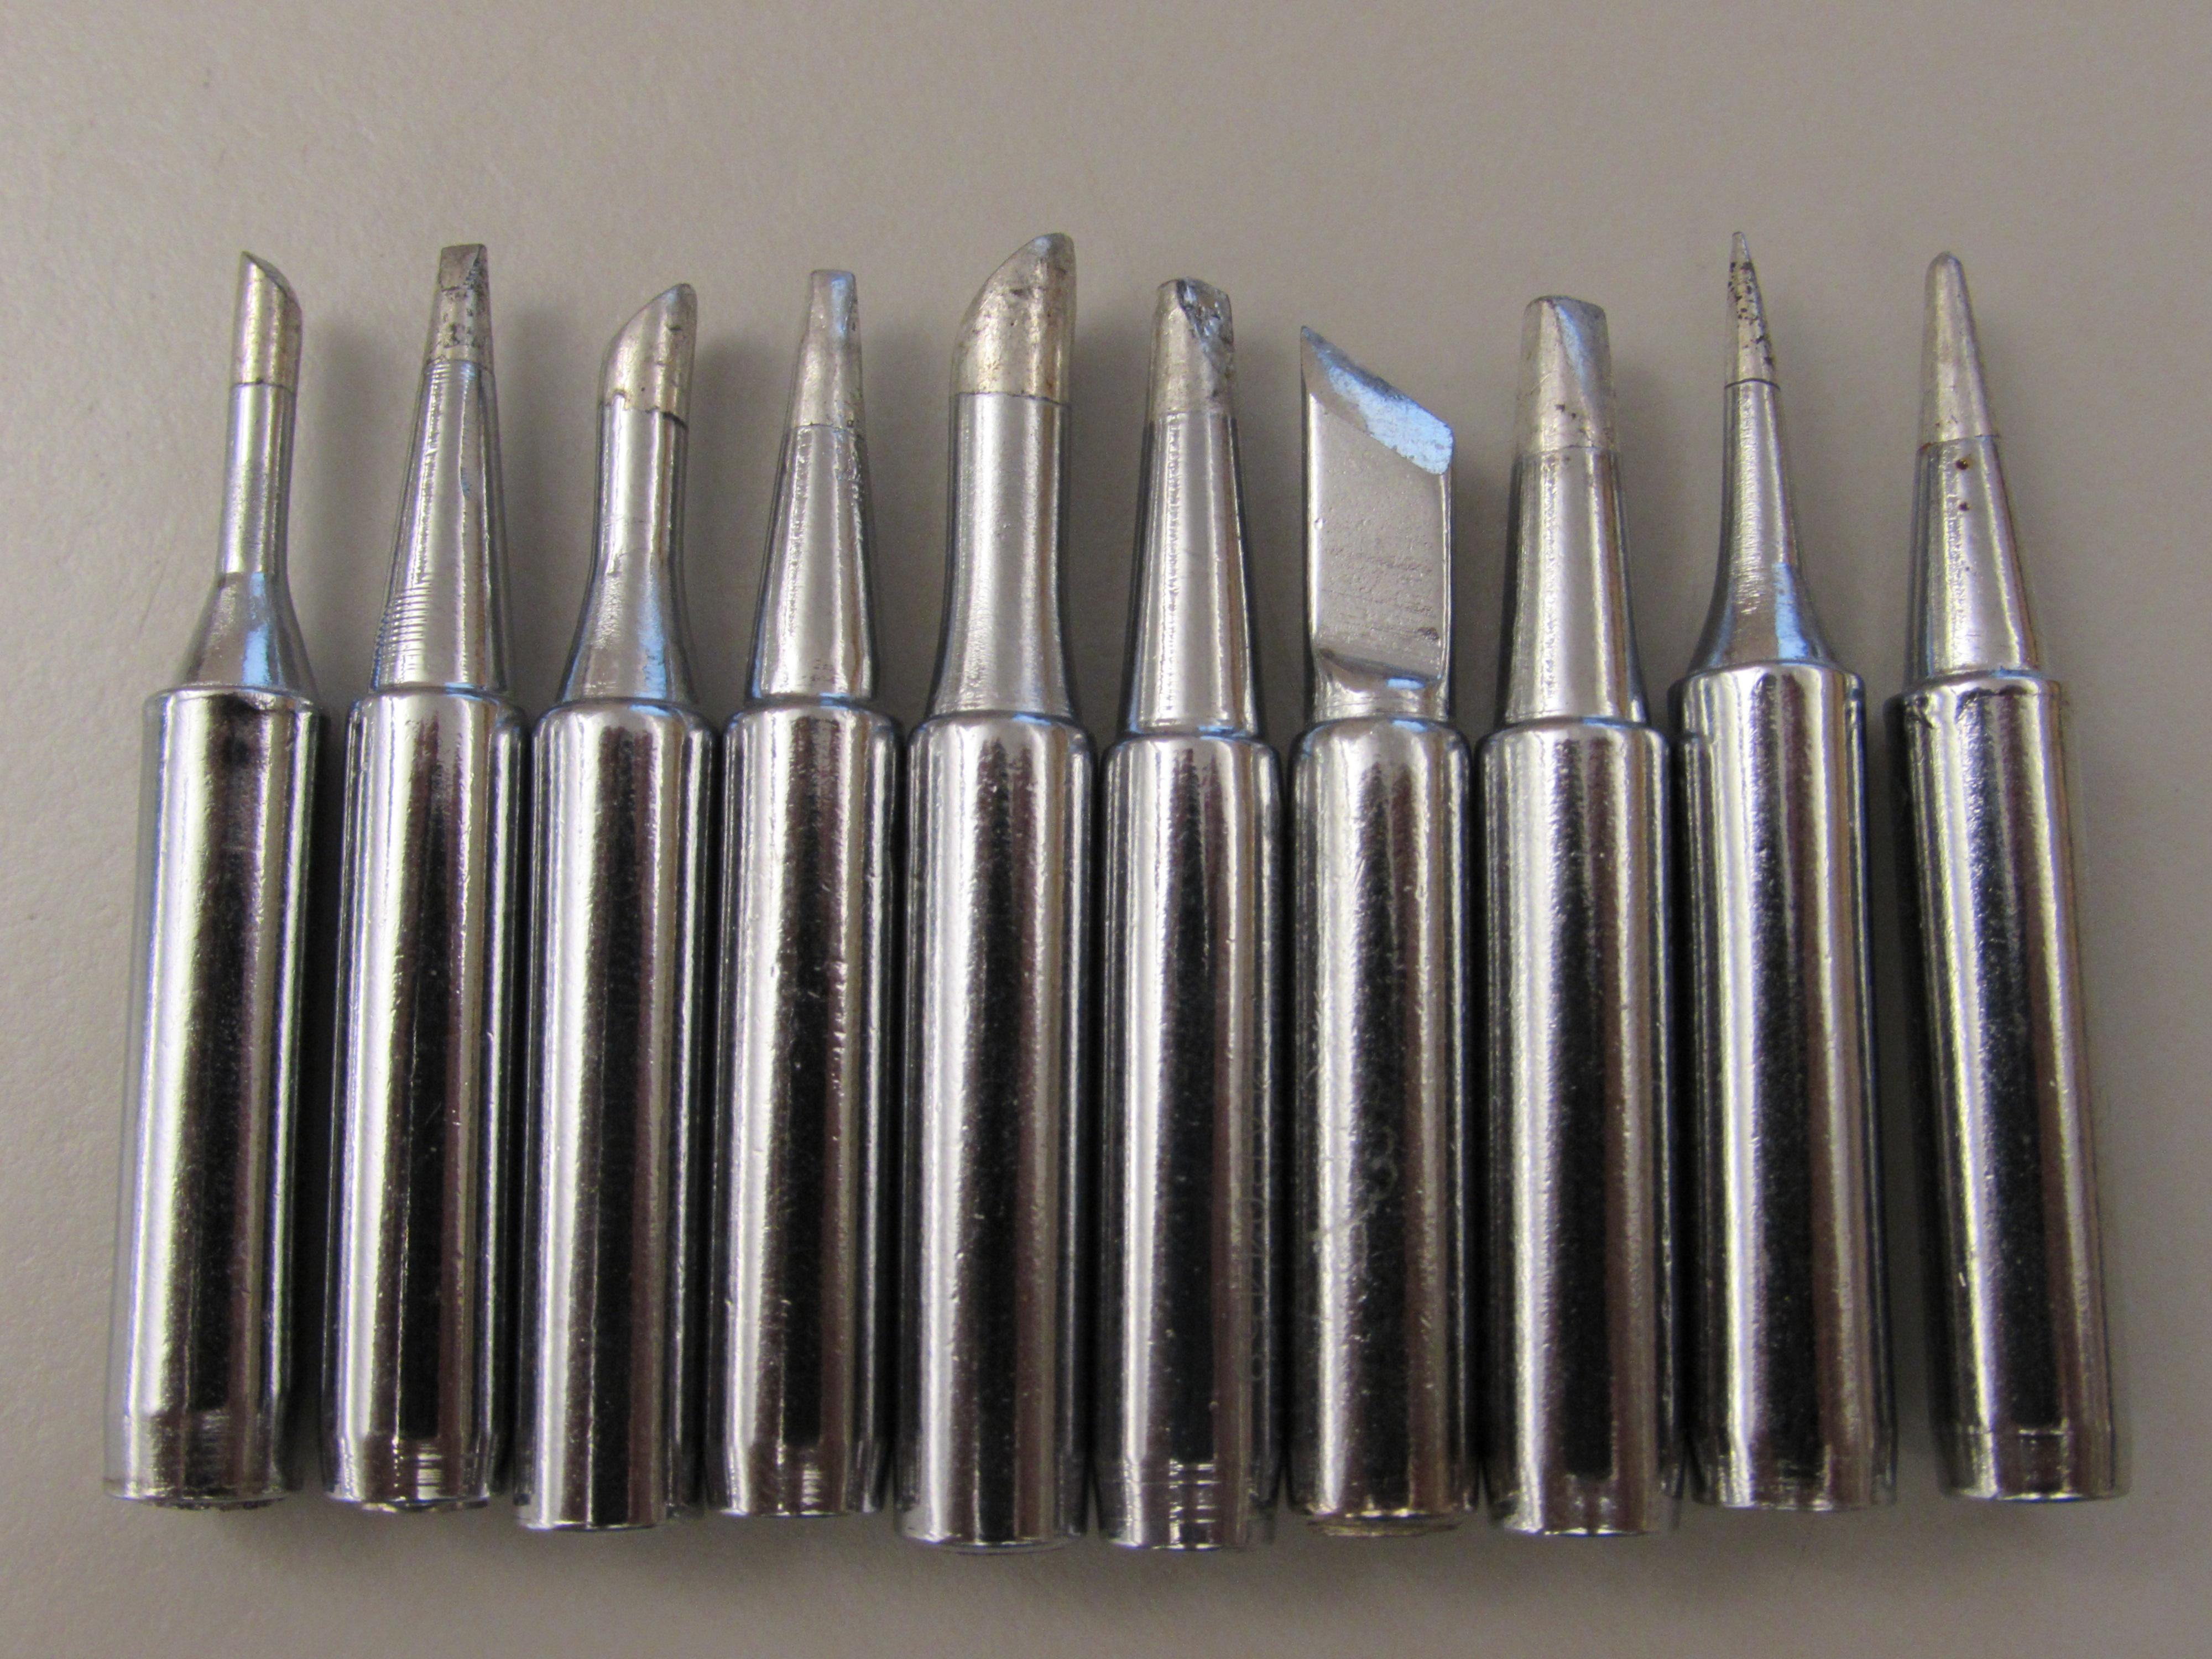 Soldering iron tip photo